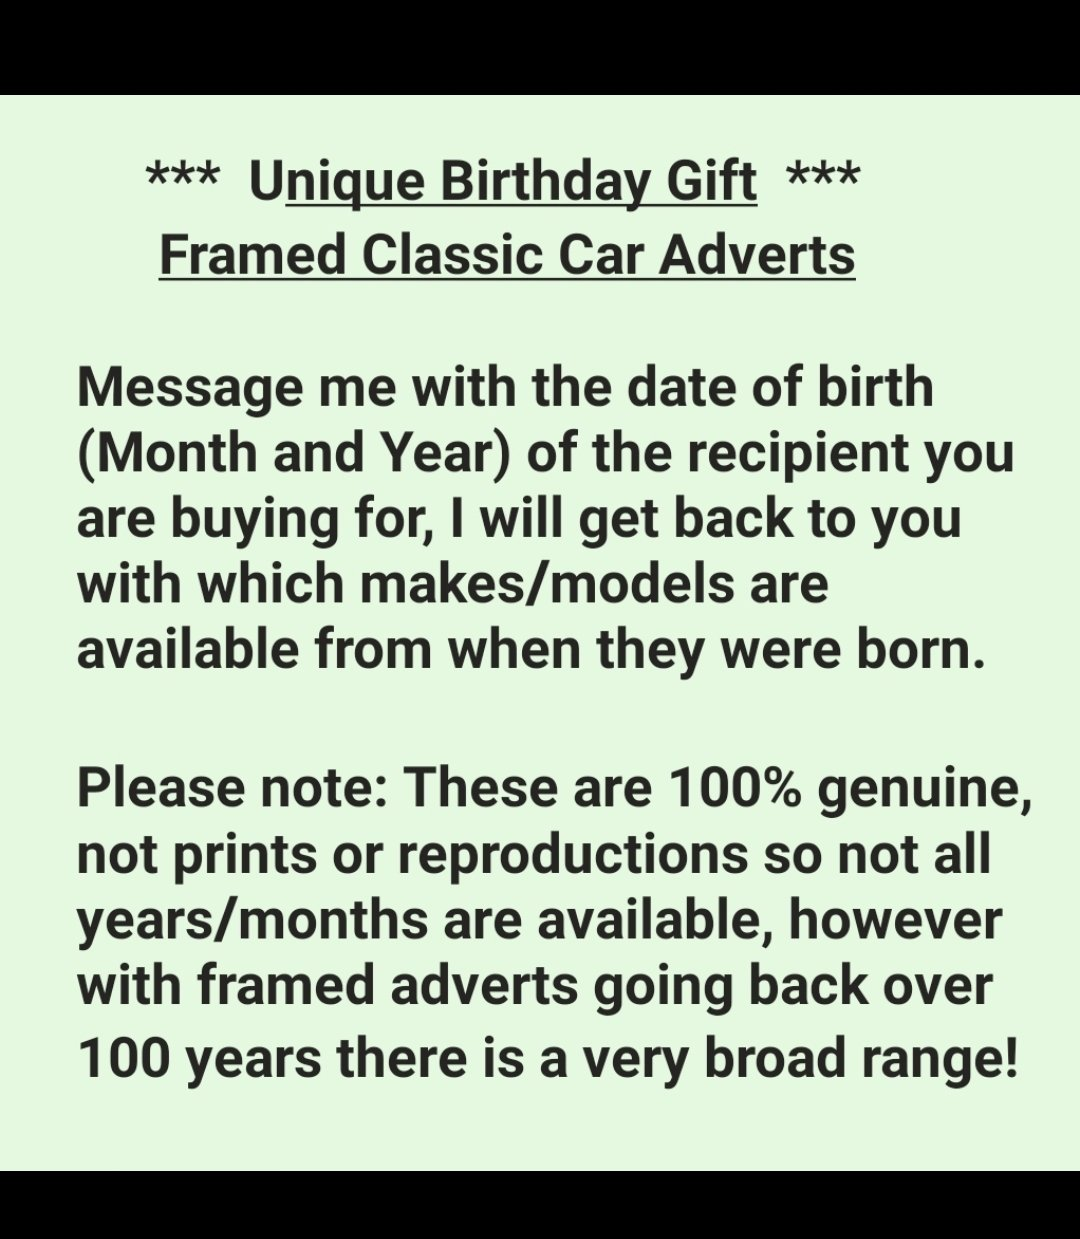 1966 Original 1933 Rolls-Royce Framed Advert  For Sale (picture 3 of 3)